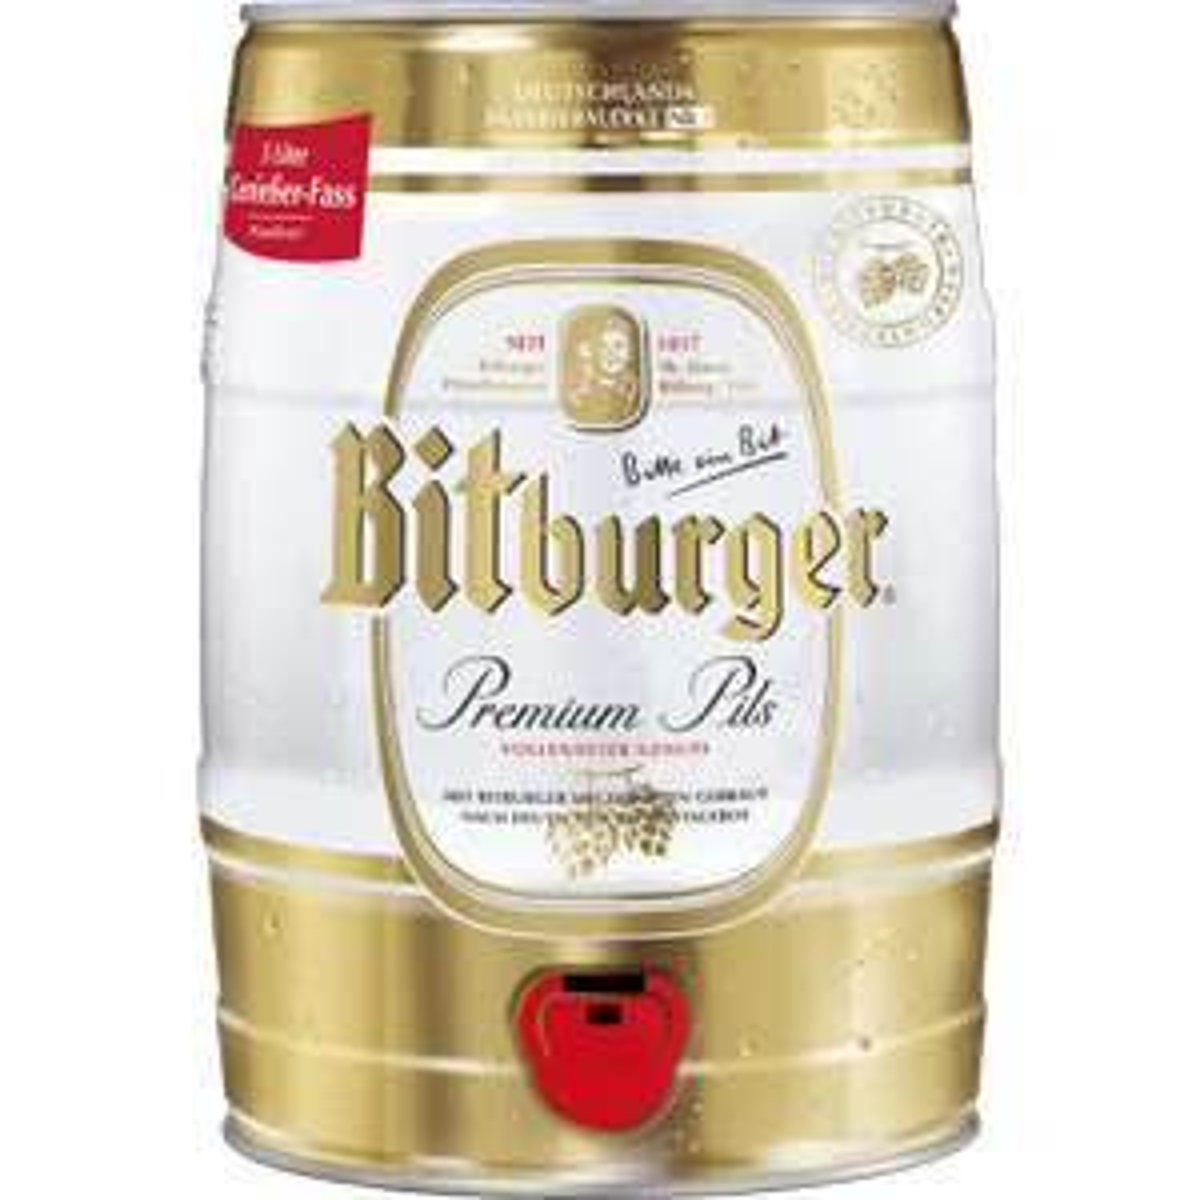 [LOKAL Aldi Achim-Baden] Bitburger 5L Premiumfass